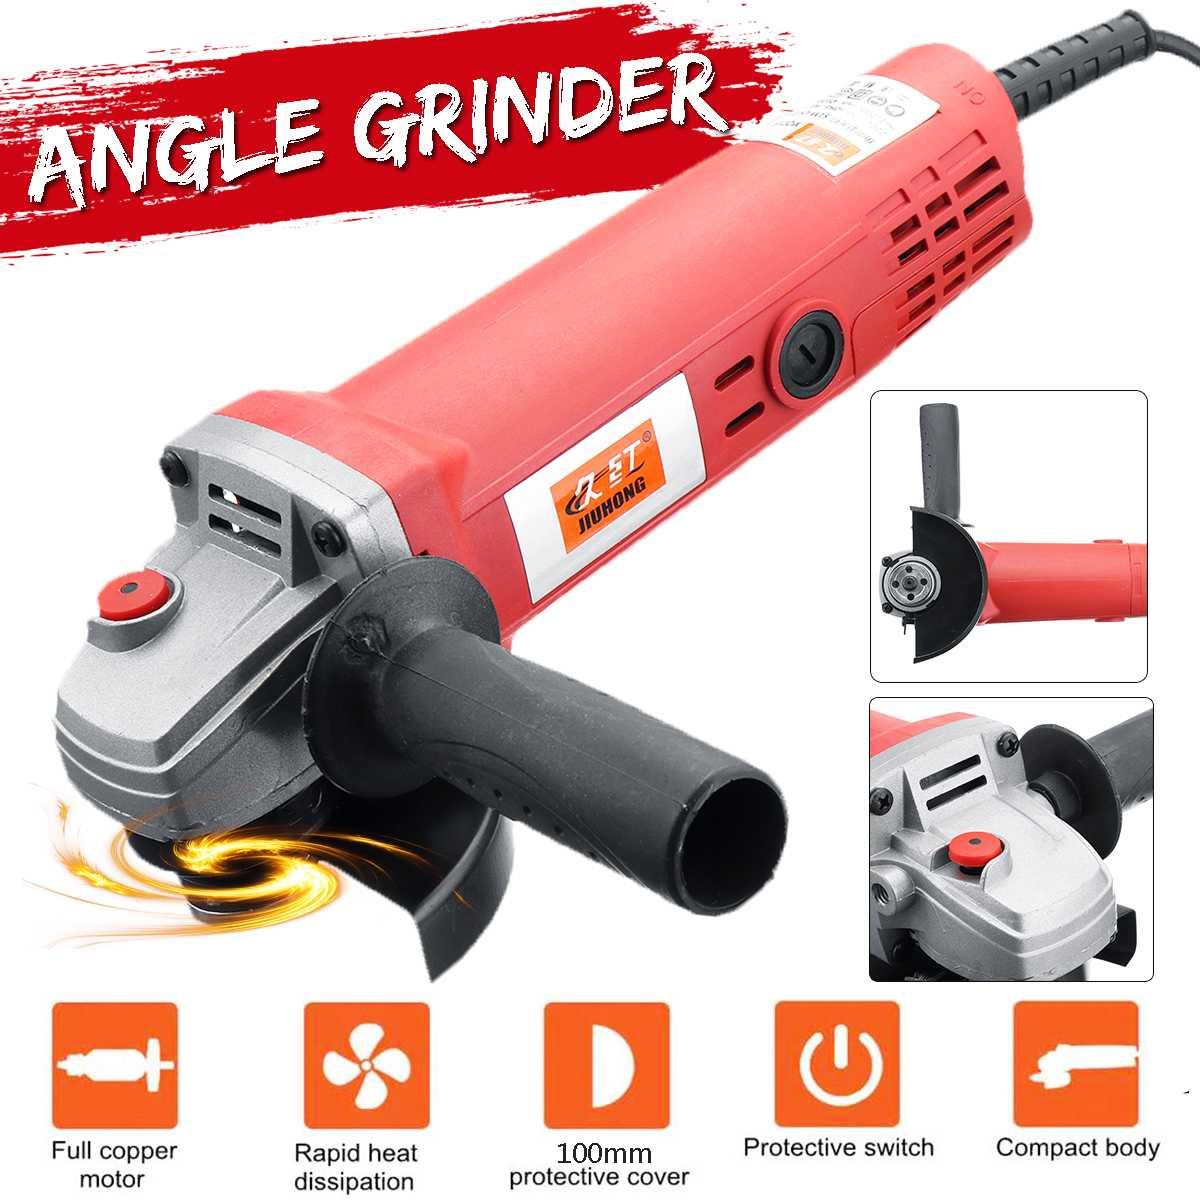 220V EU Plug Electric Angle Grinder 1350/980W 115/100mm Adjustable Speed Metal Cutting Tool 360 Rotation Adjustable Anti-slip